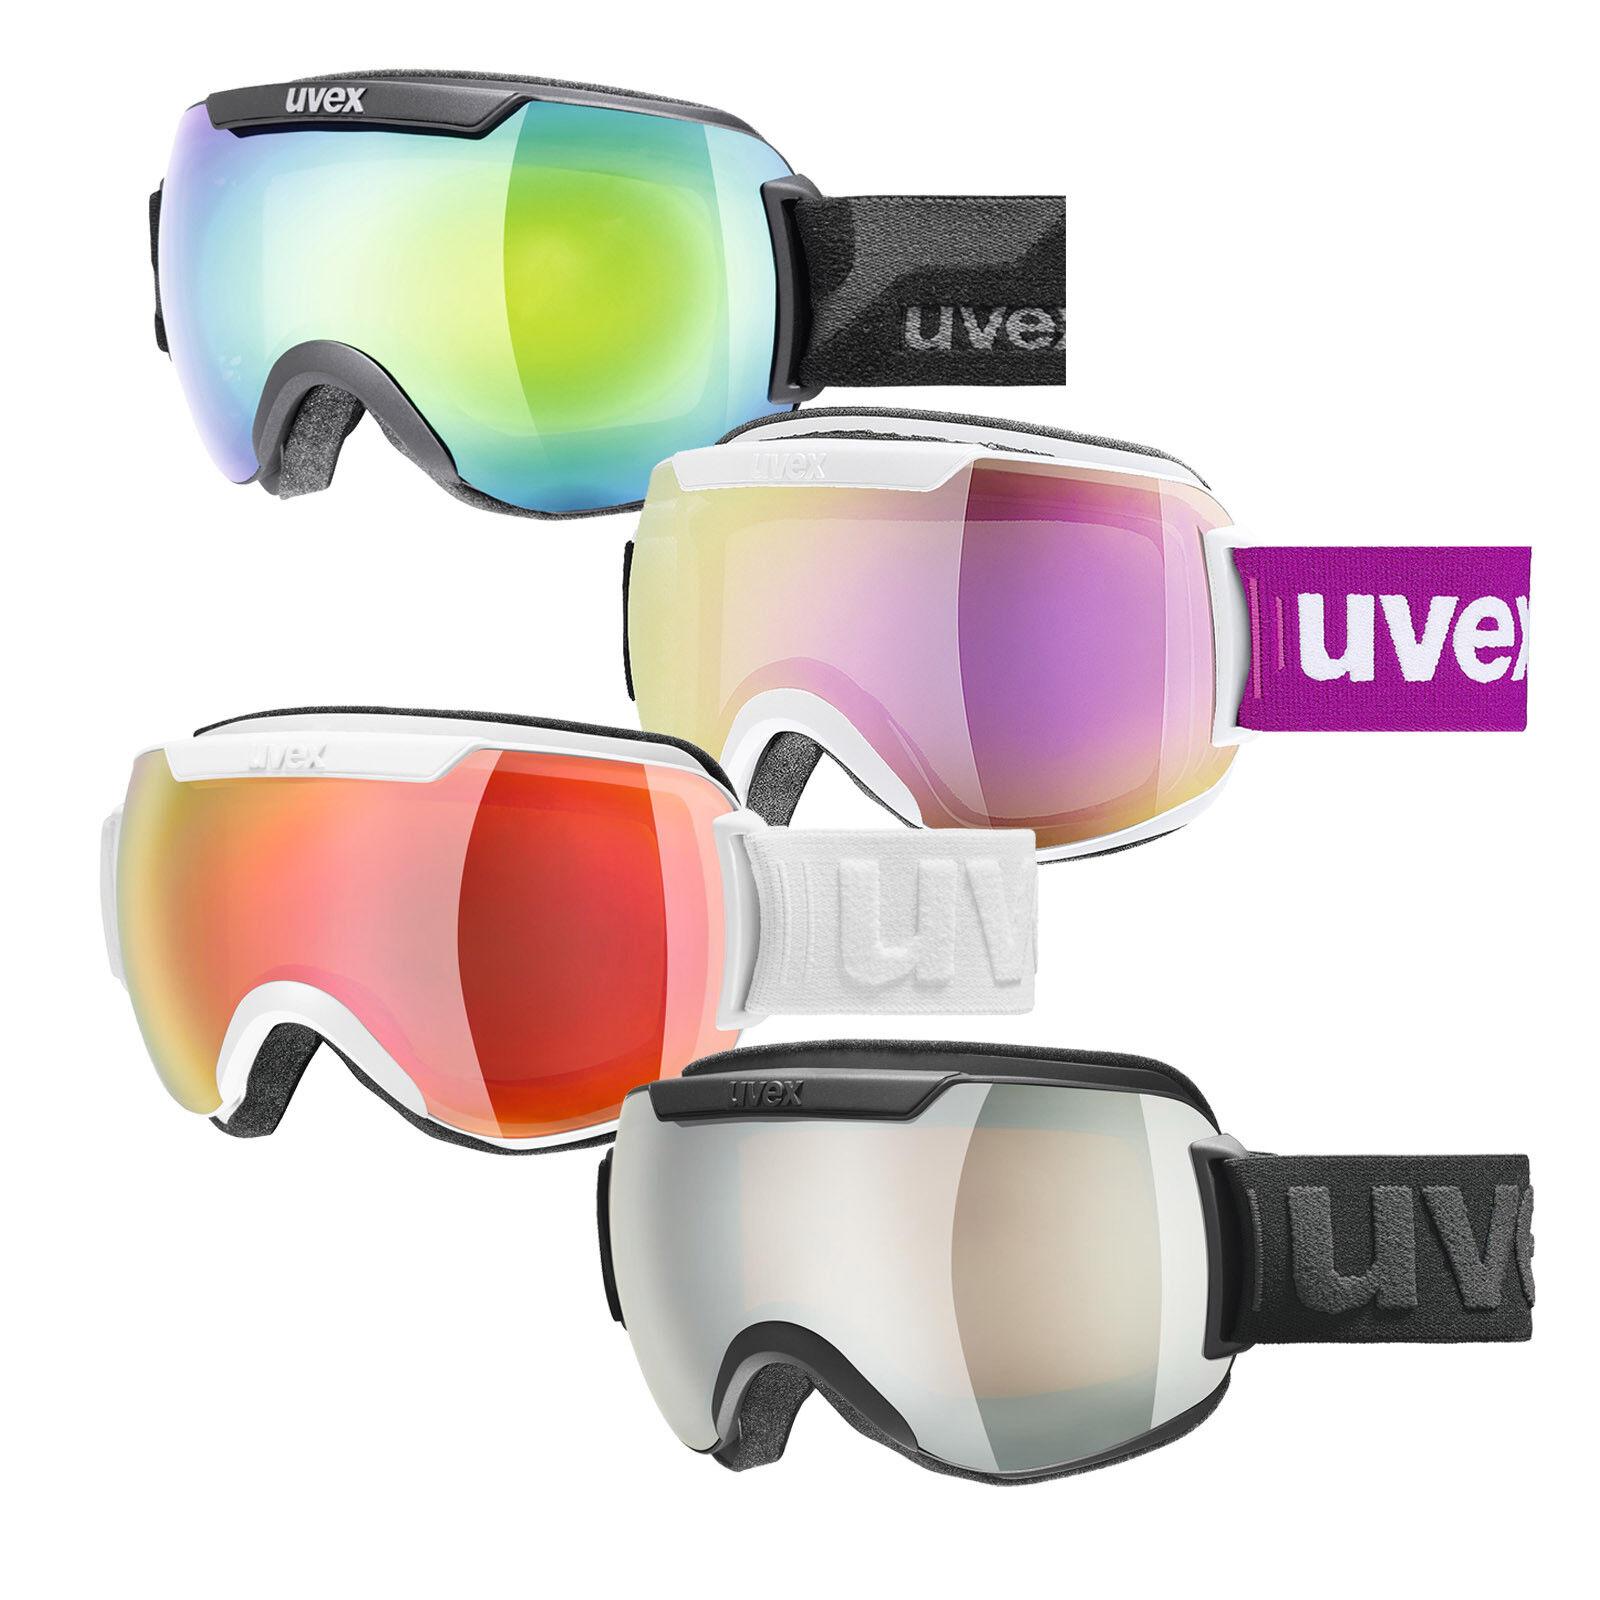 Uvex Downhill 2000FM - Frameless Ski Goggles   shop clearance